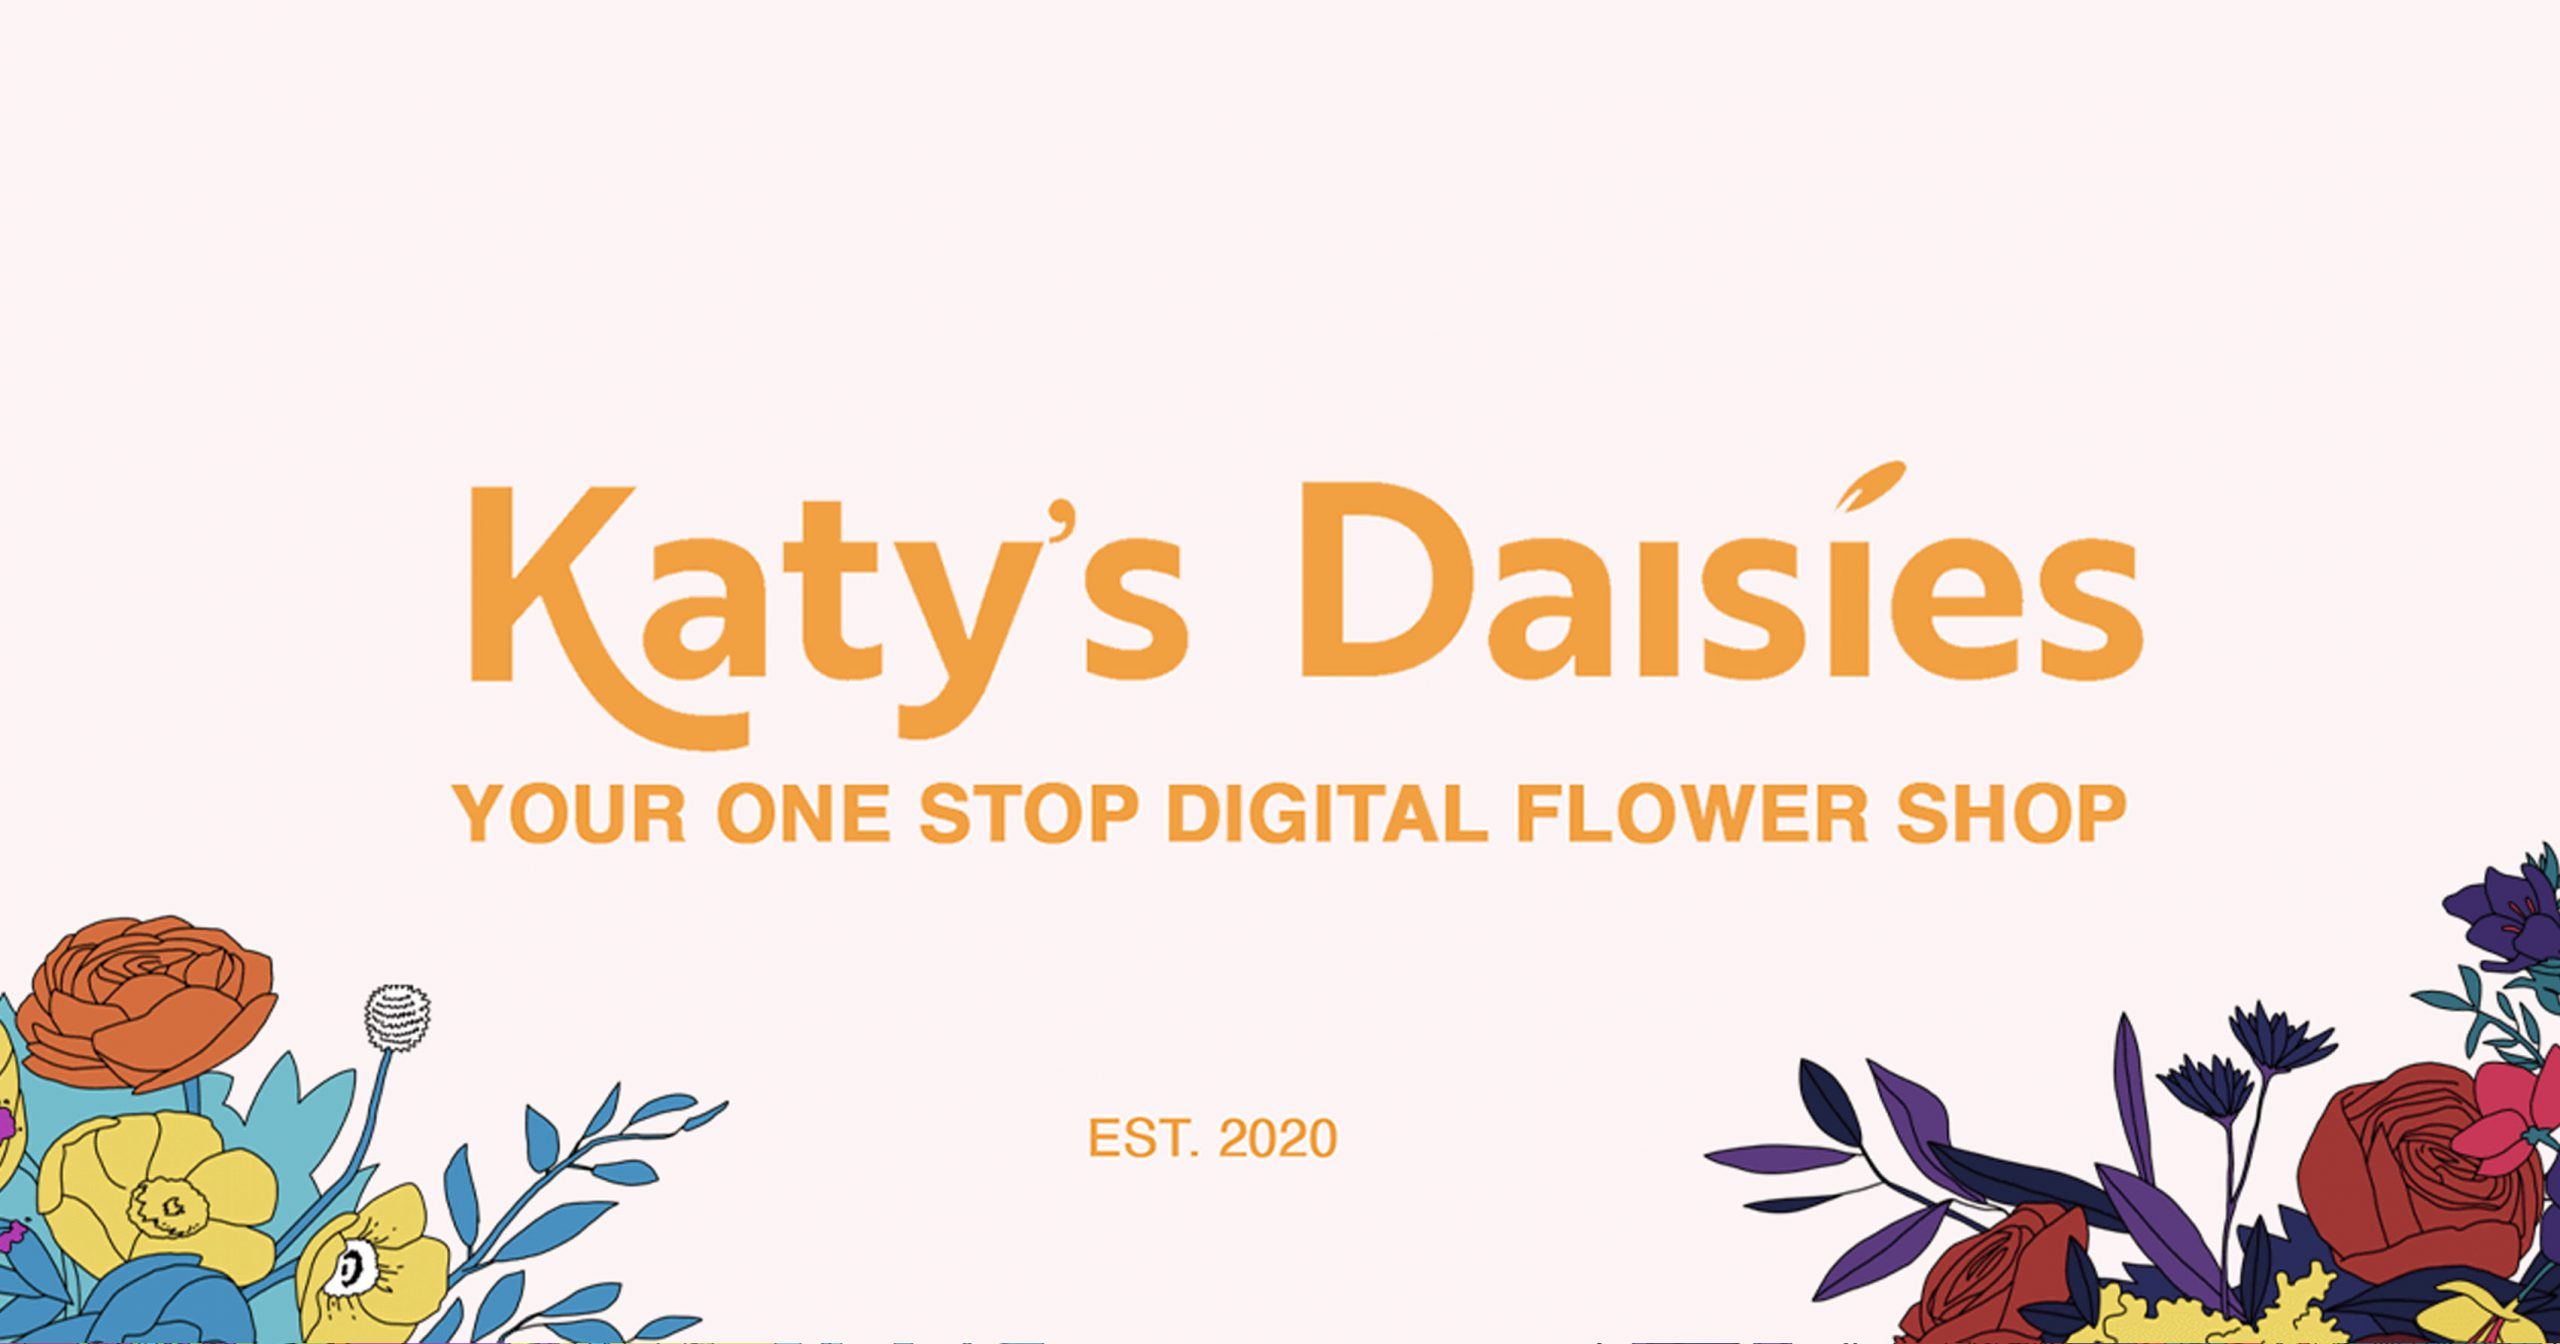 Katy's Daisies